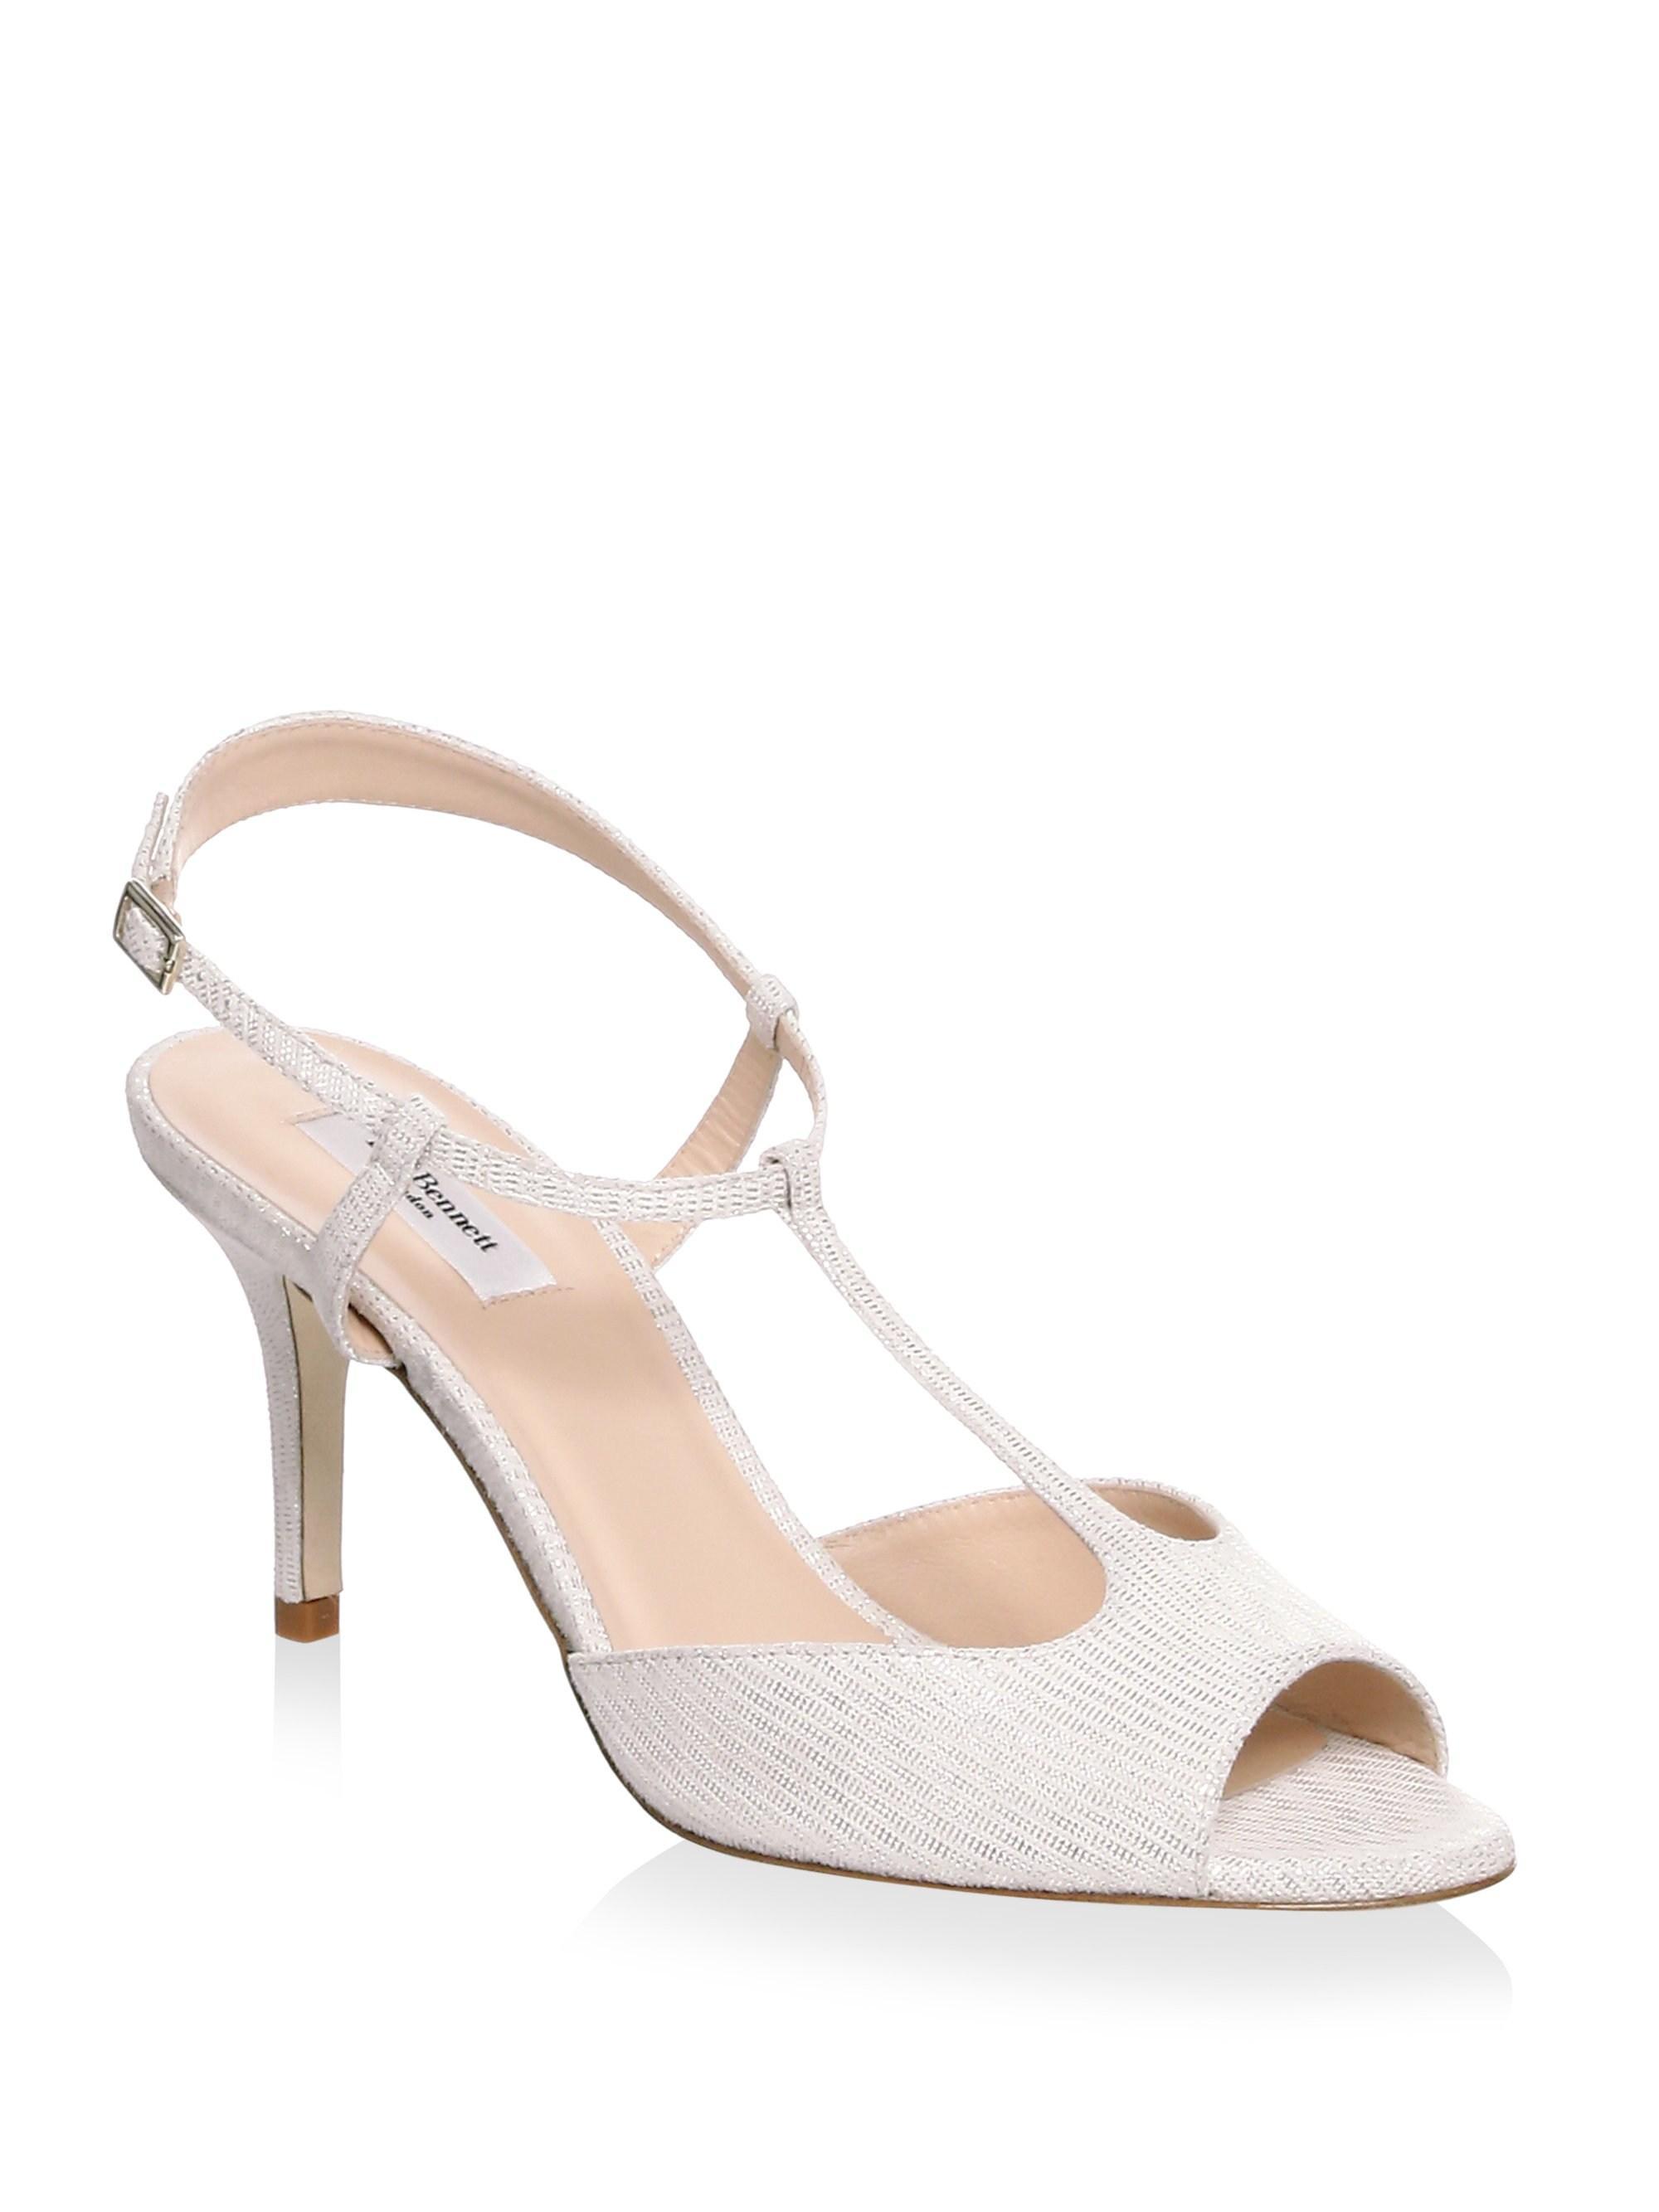 58122ba1429f Lyst - L.K.Bennett Quinn Suede Sandals in Metallic